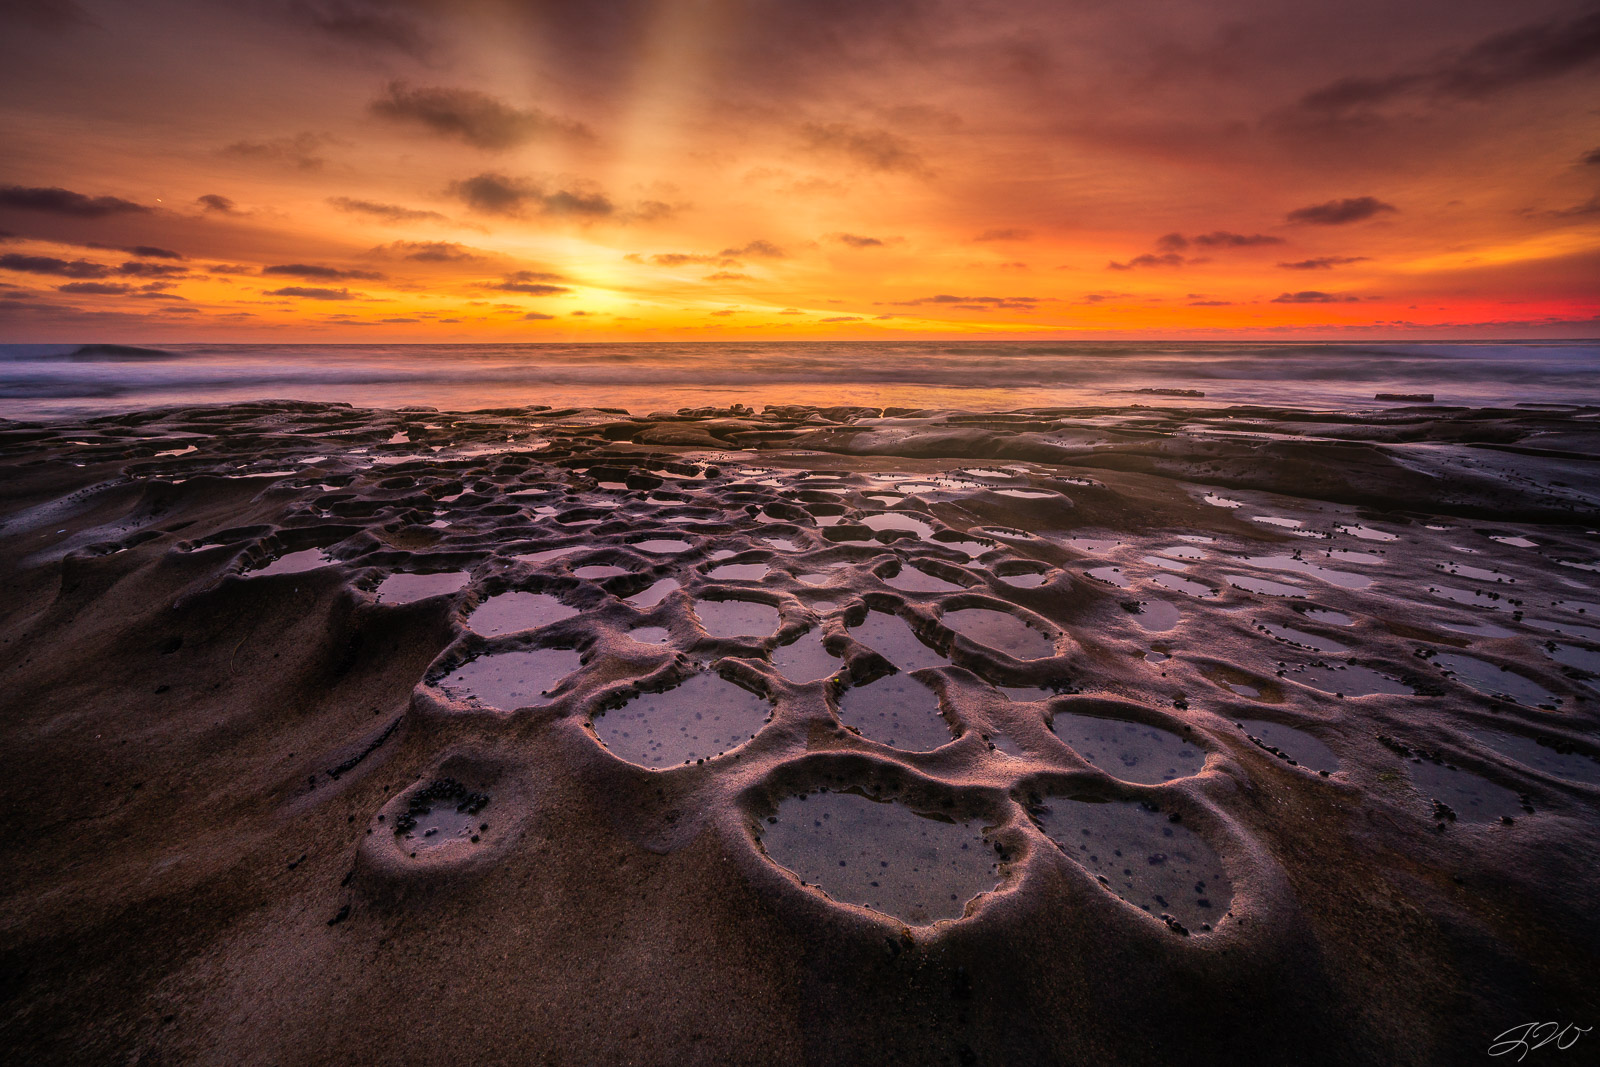 la jolla, california, san diego, southern california, pacific ocean, seascape, sunset, tide pool    , photo